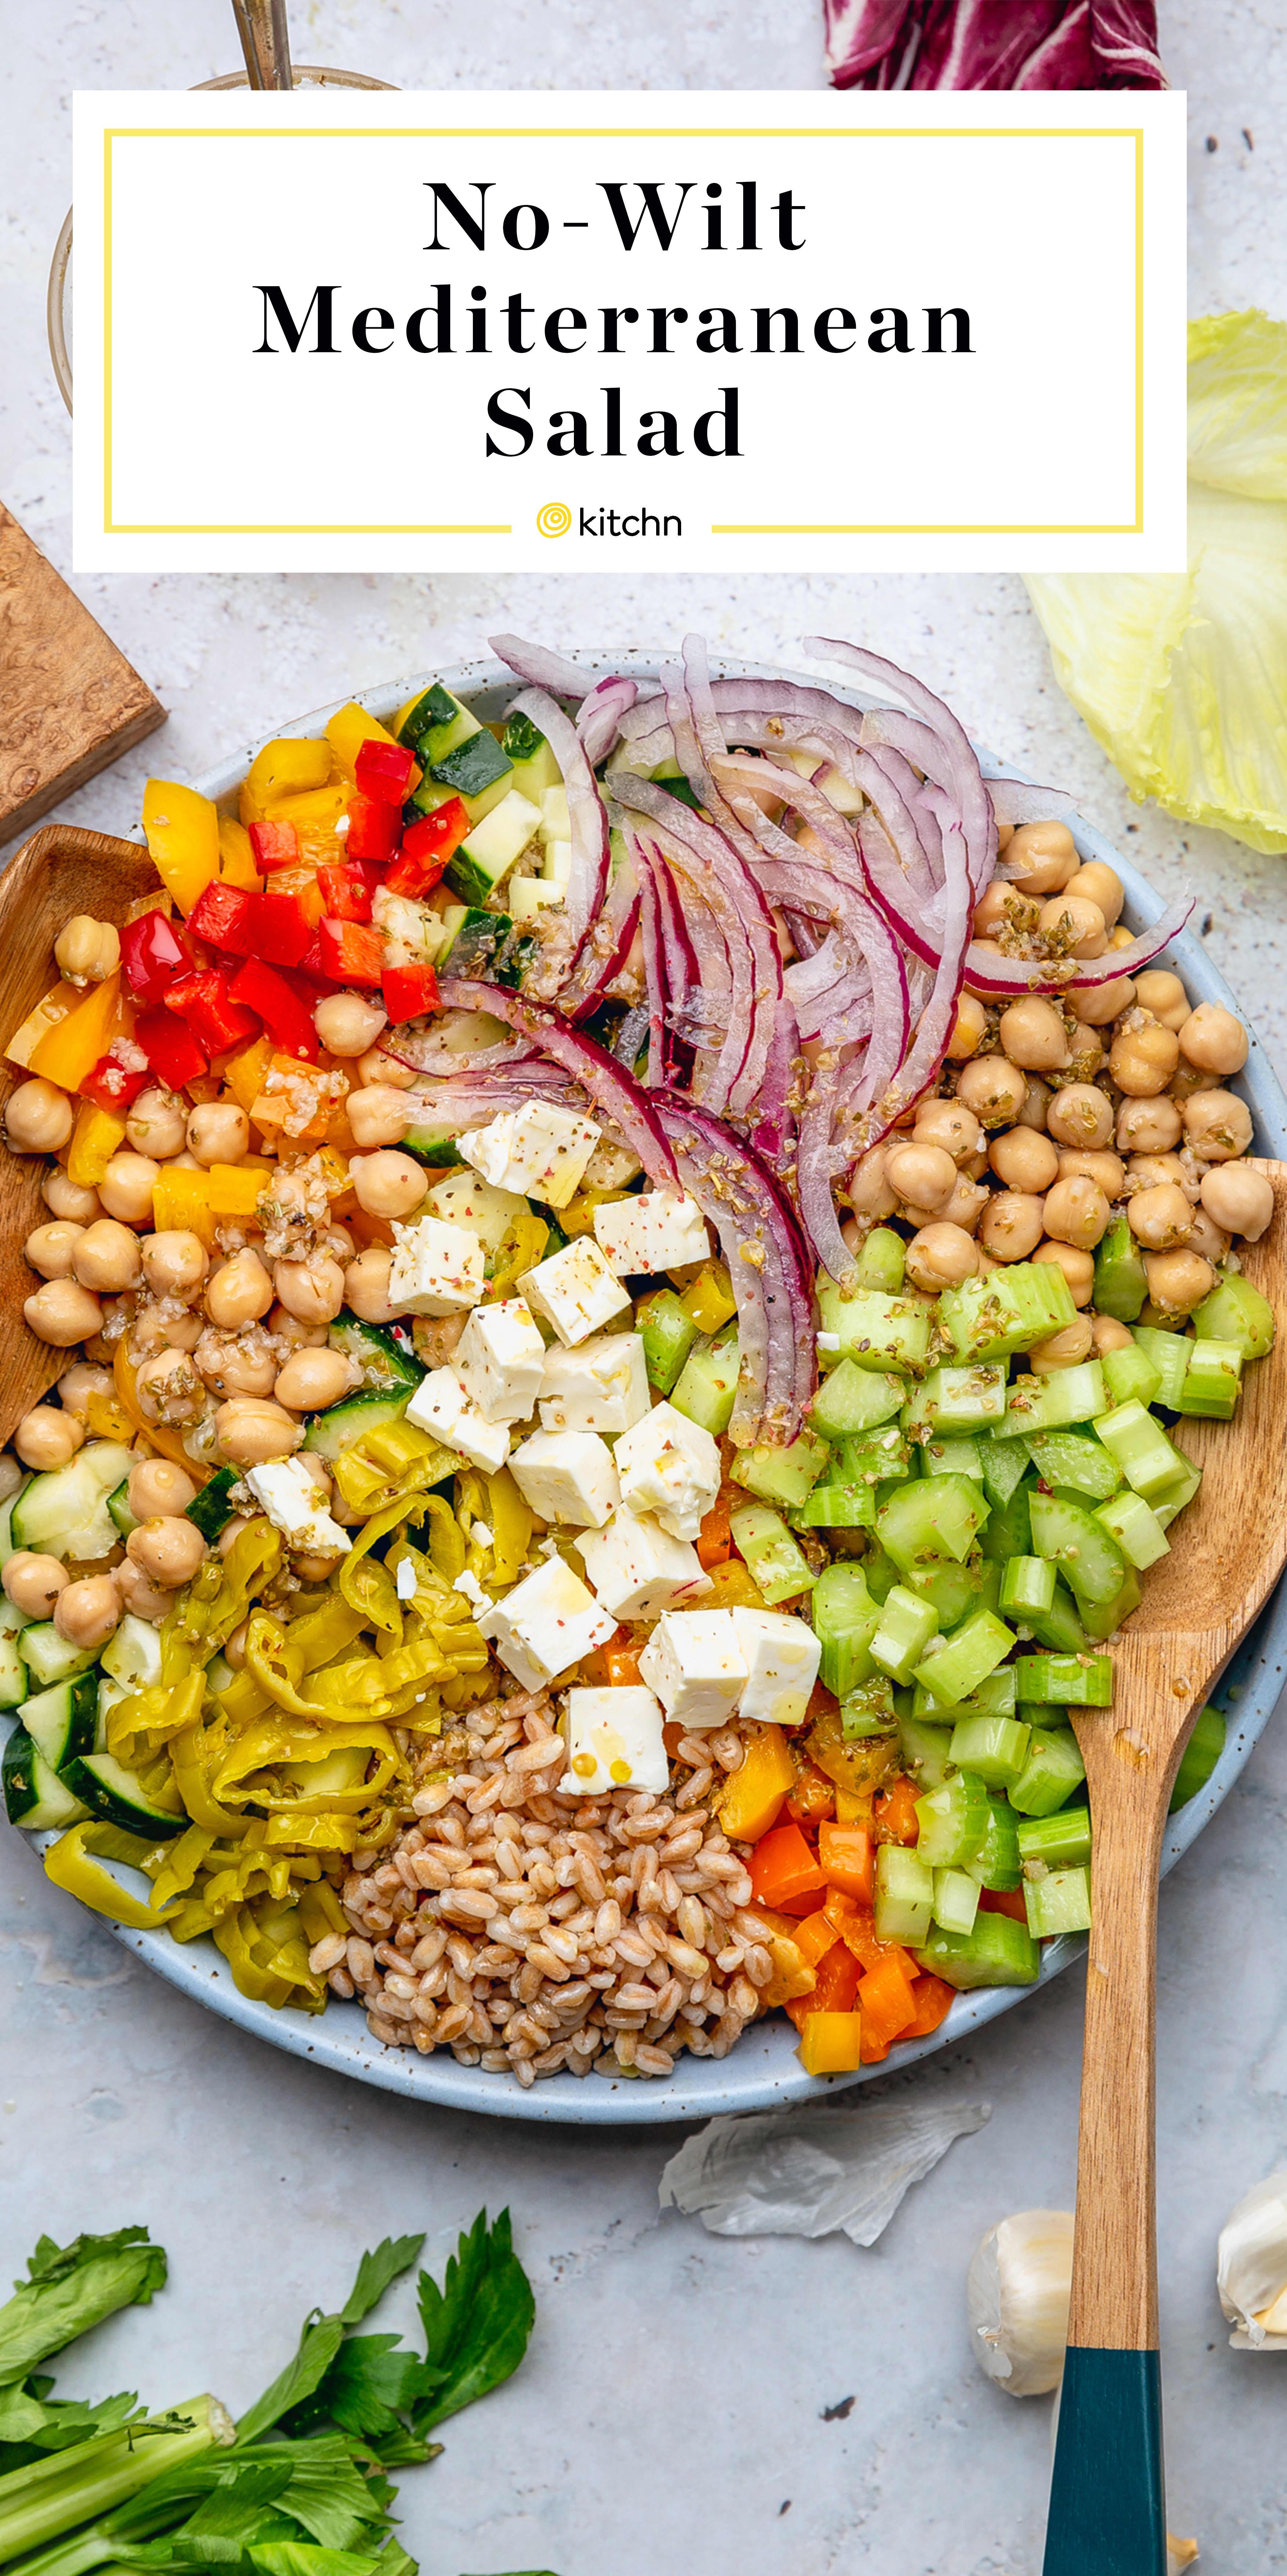 Mediterranean Style Chopped Salad with Oregano Vinaigrette